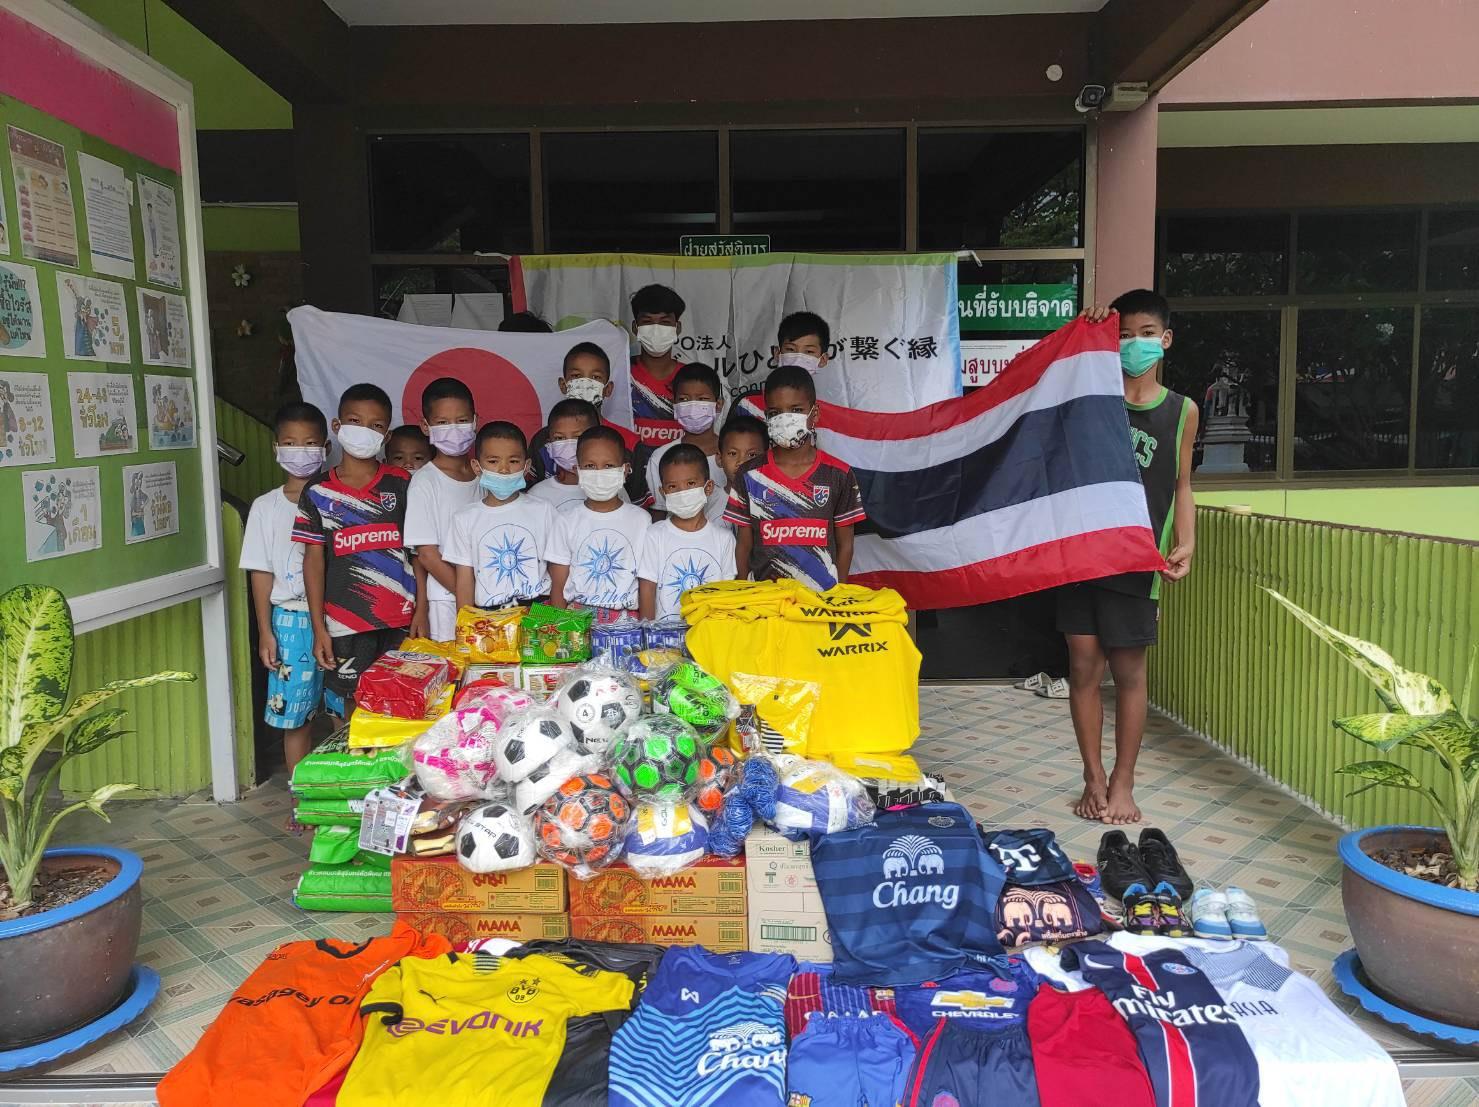 NPOボールひとつが繋ぐ縁集合写真 タイ王国 バンコク bannmahamek LIVE支援(2021年4月17日)